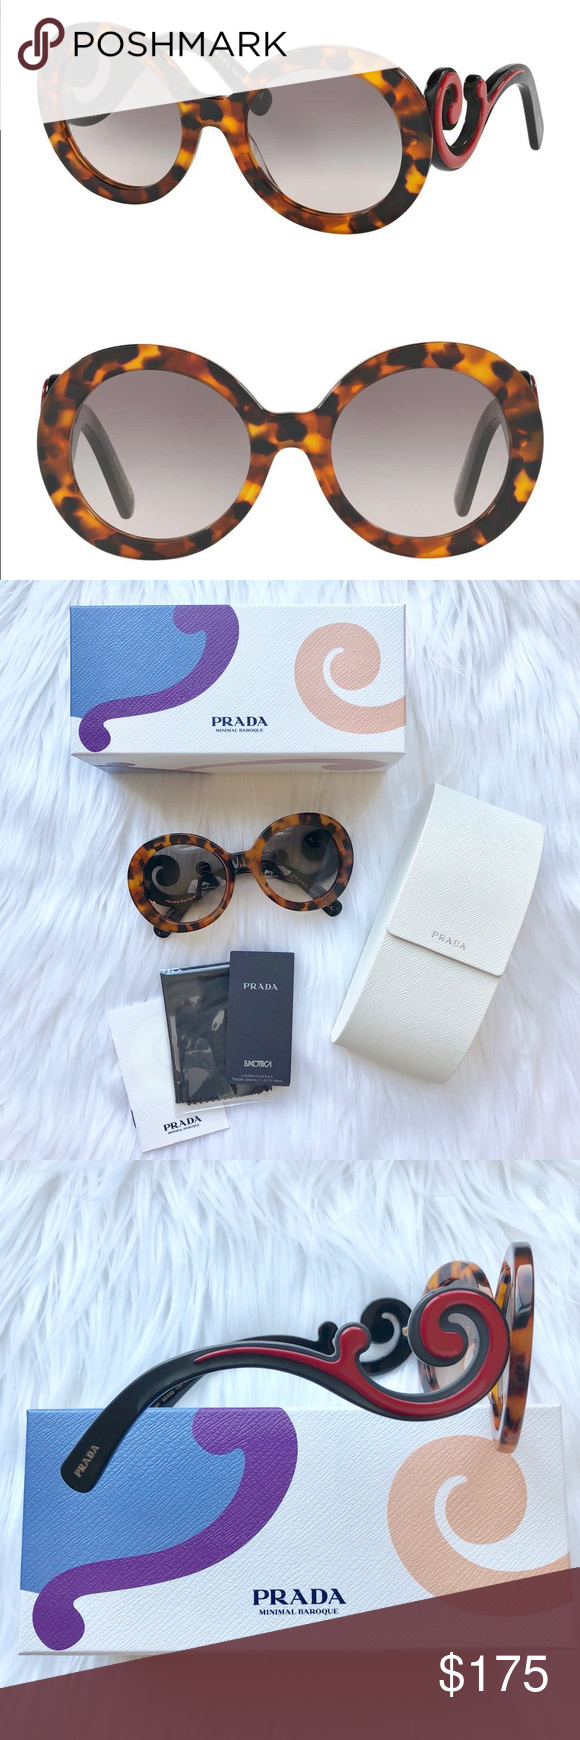 99967759e NEW // Prada Minimal Baroque Sunglasses Authentic Prada SPR 08T ...